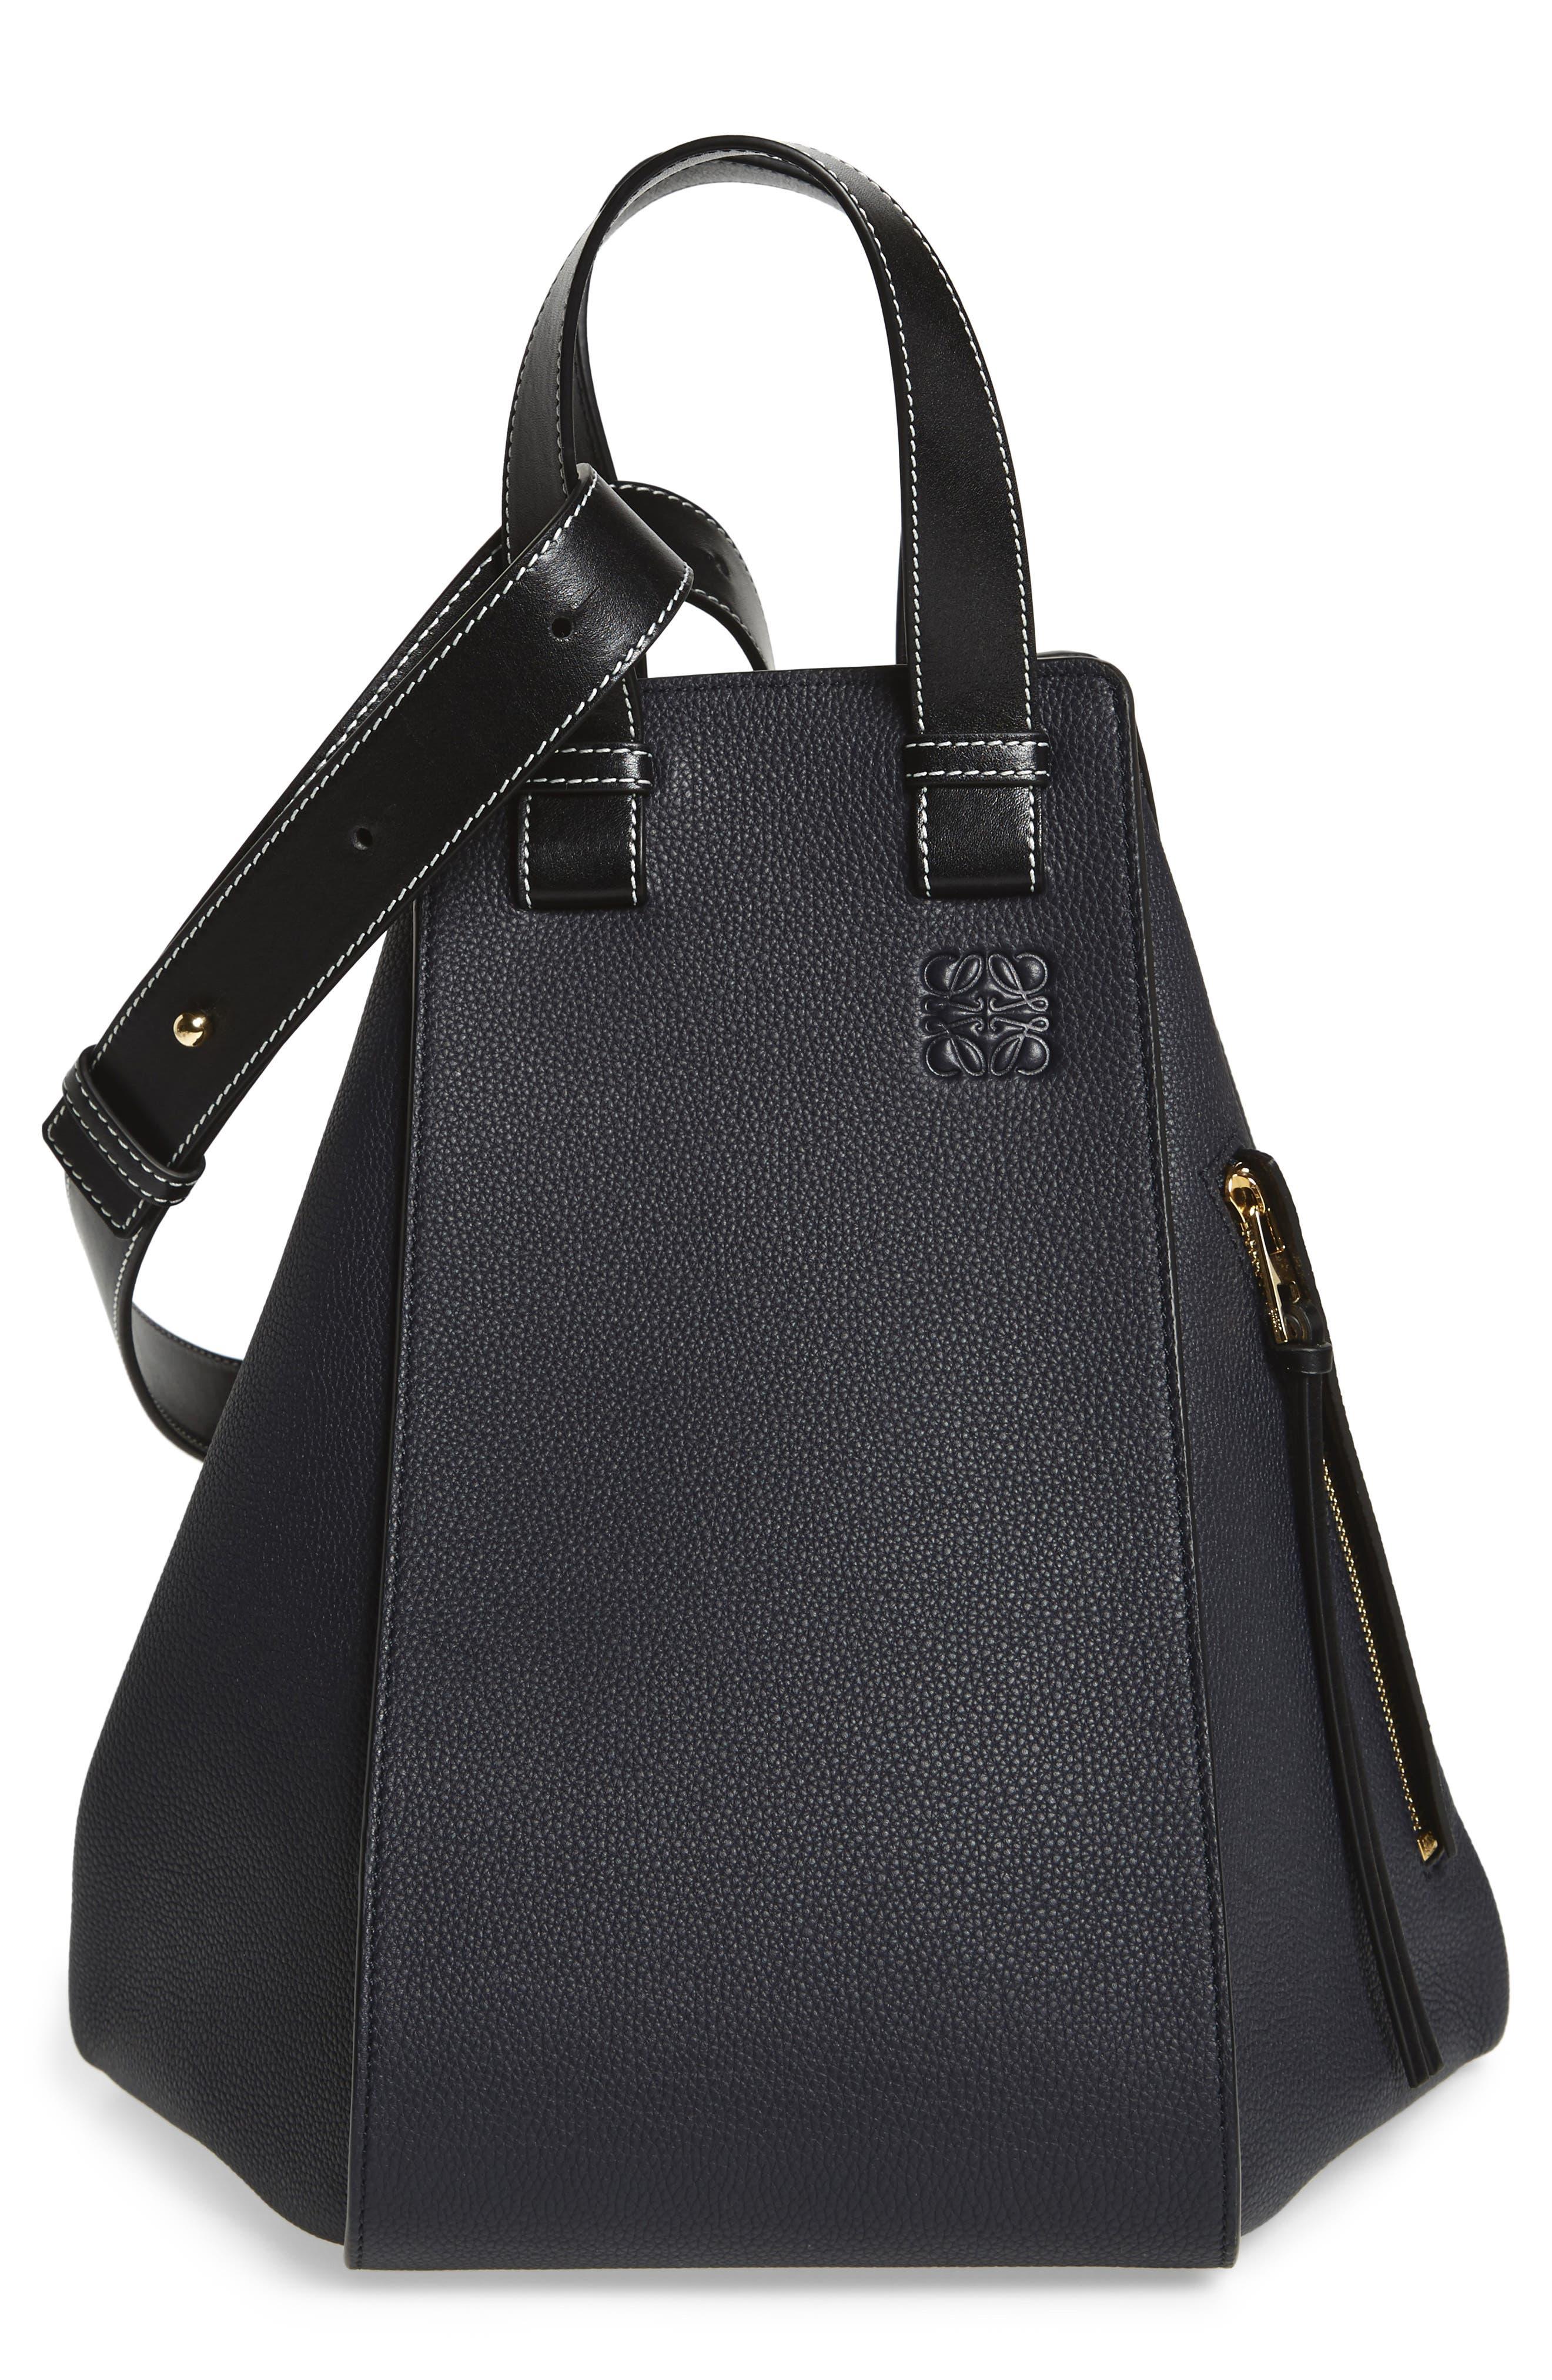 Main Image - Loewe Medium Hammock Calfskin Leather Shoulder Bag